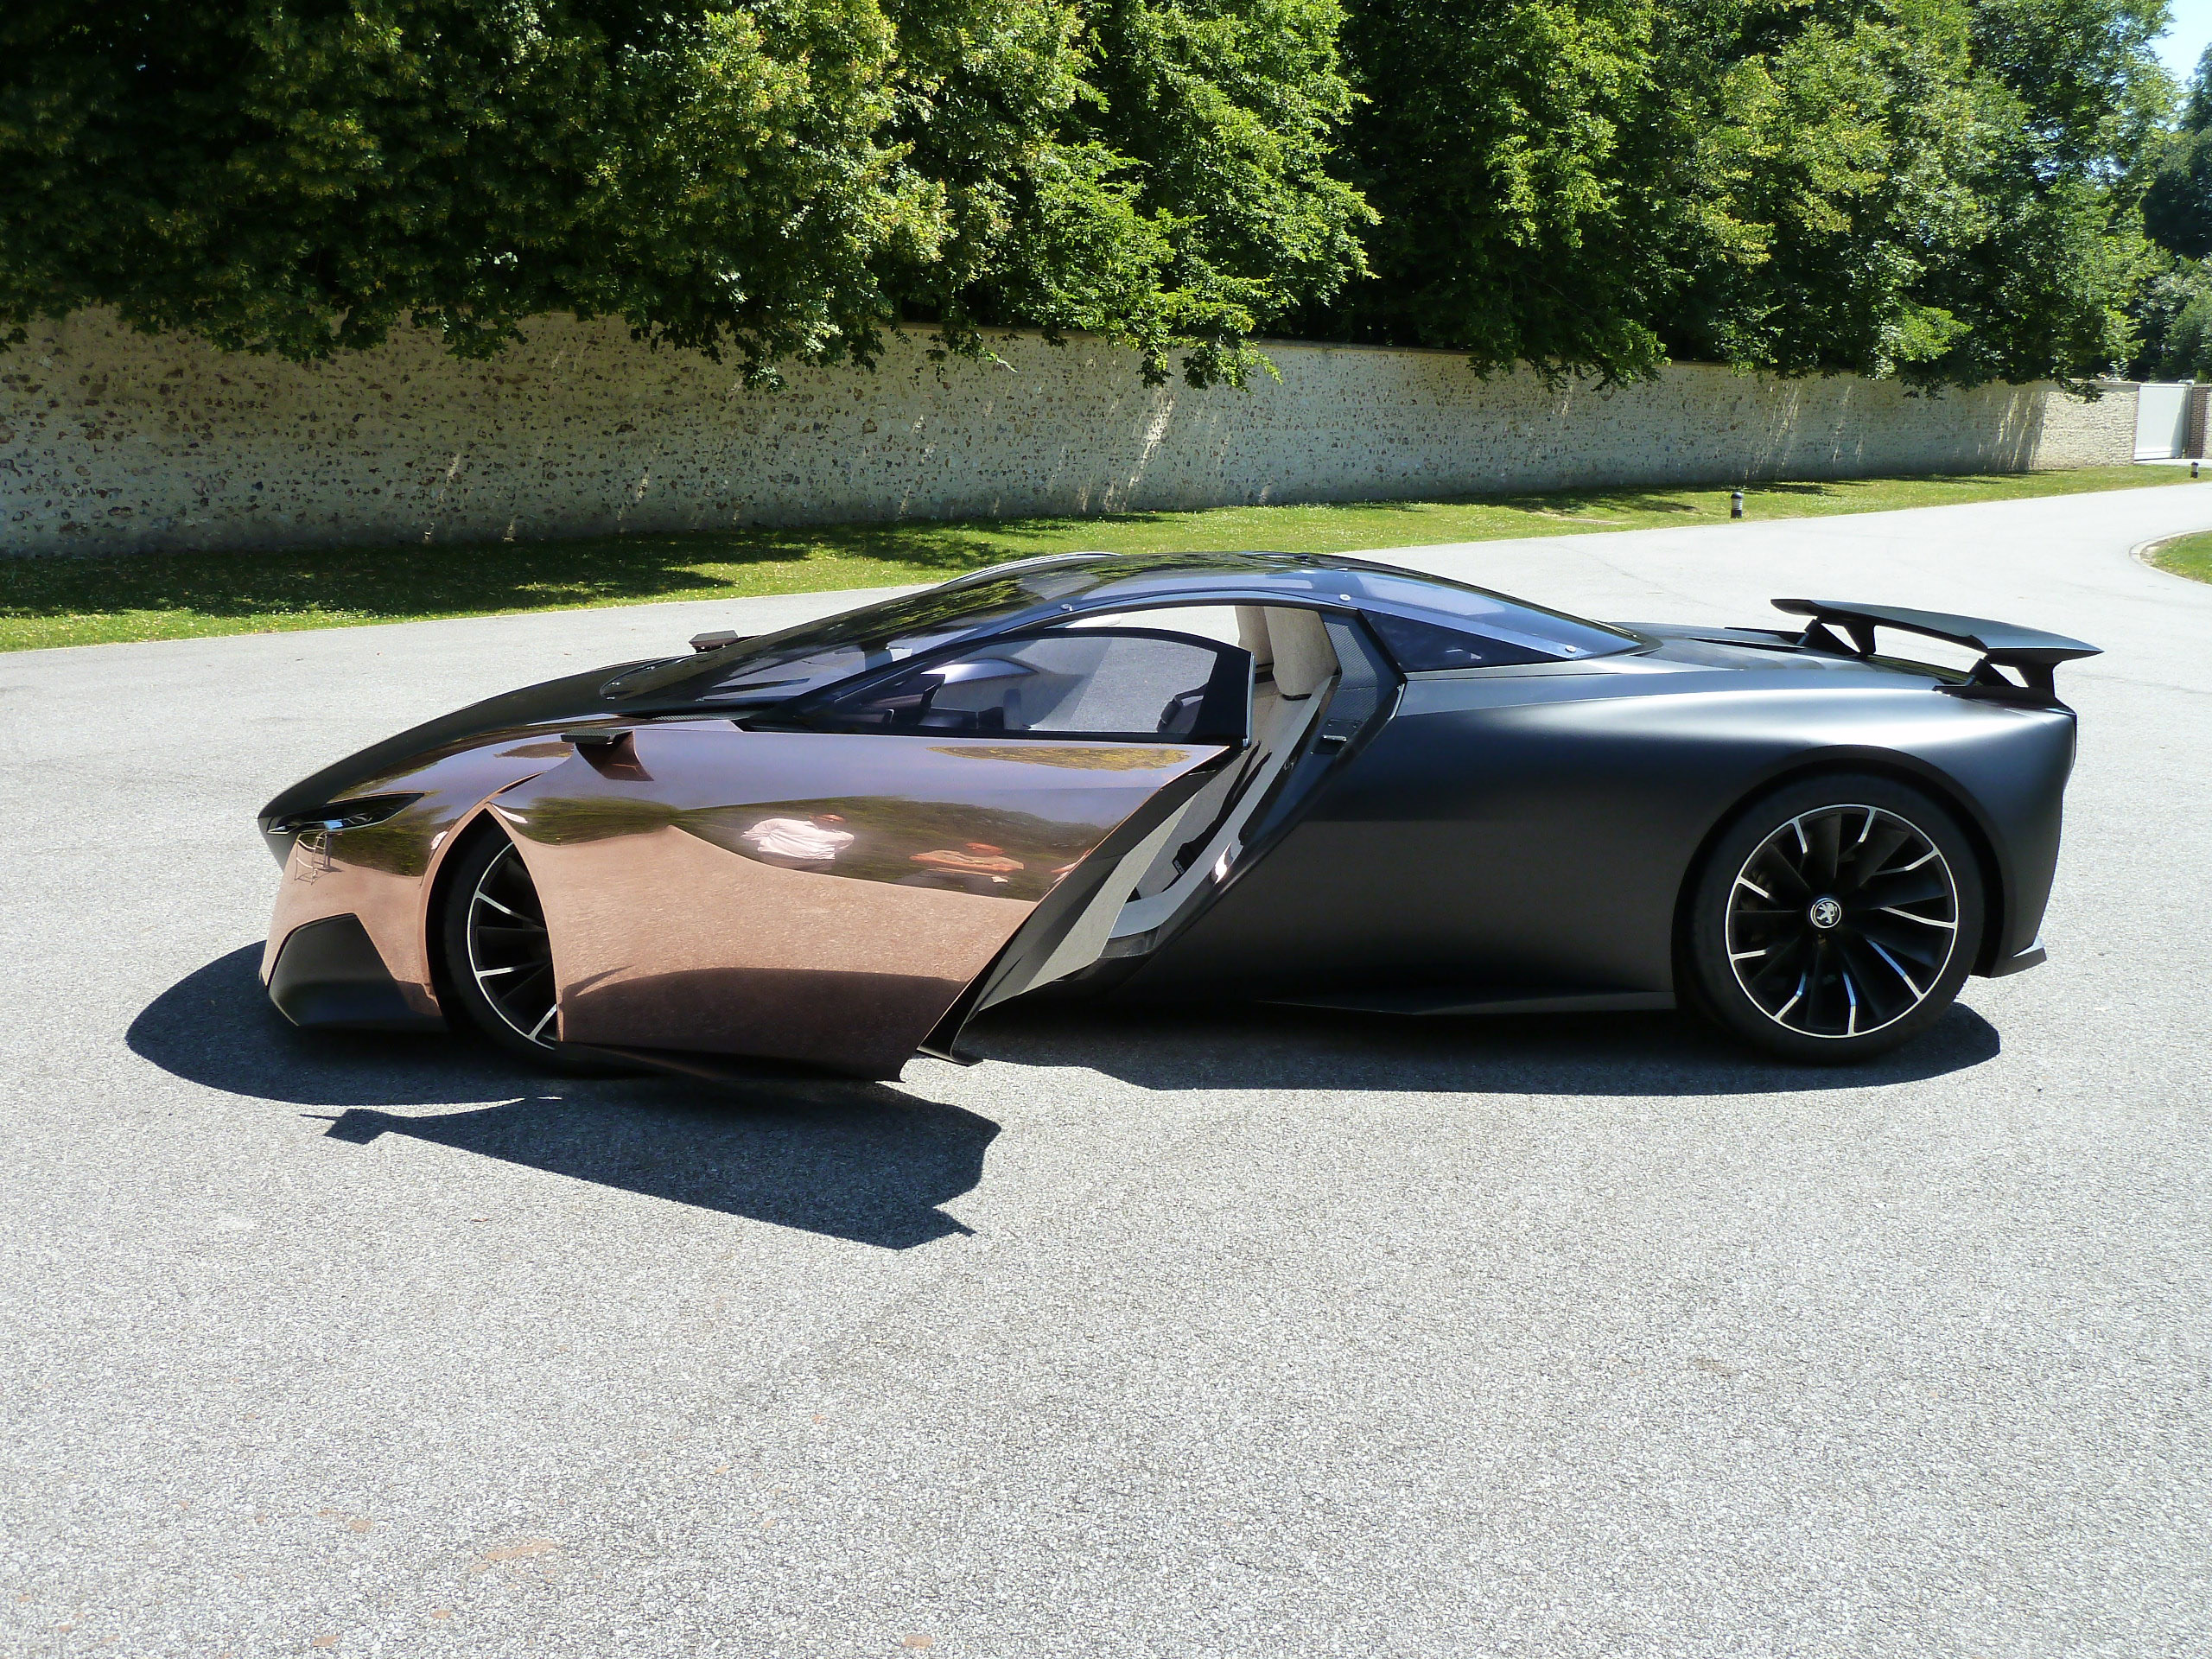 Used Bmw M5 >> 2013 Peugeot Onyx Concept - HD Pictures @ carsinvasion.com